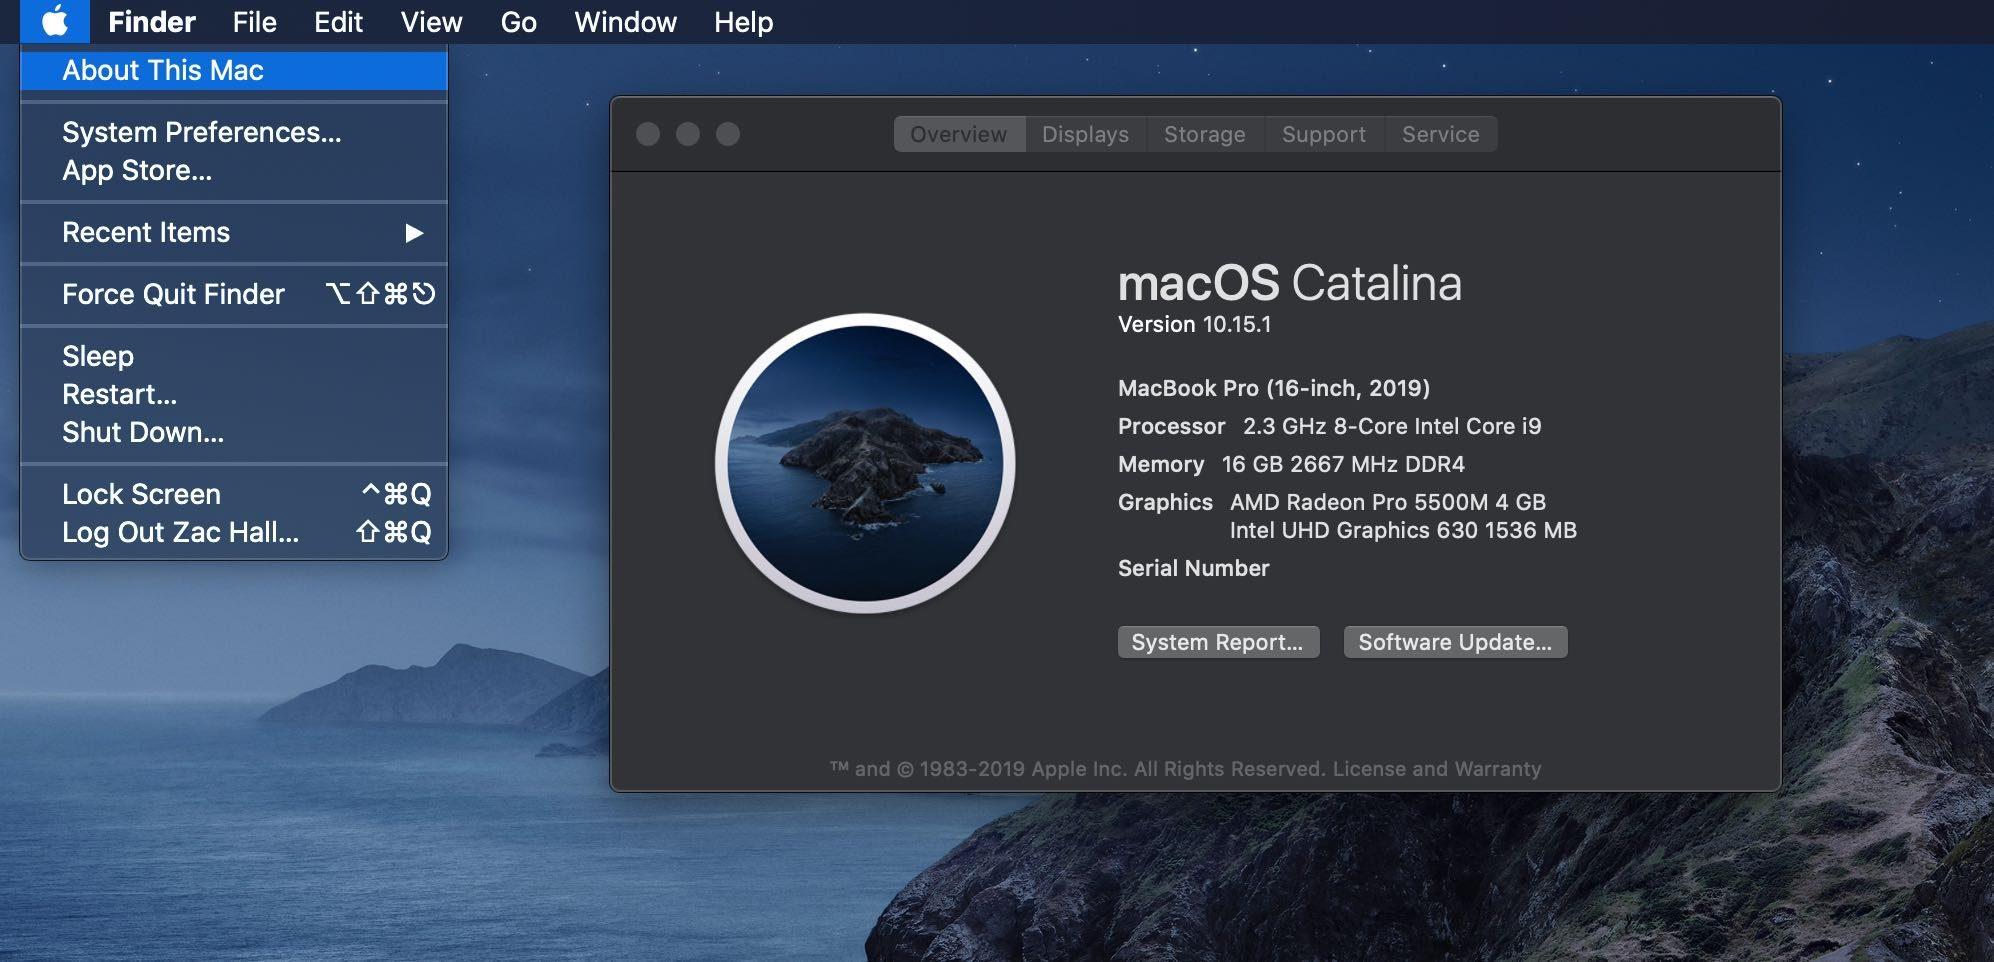 "<span href=""https://9to5mac.com/2020/01/05/how-to-use-dark-mode-macos-catalina/"">macOS Catalina: Cómo dominar el Modo Oscuro para Mac</a>"